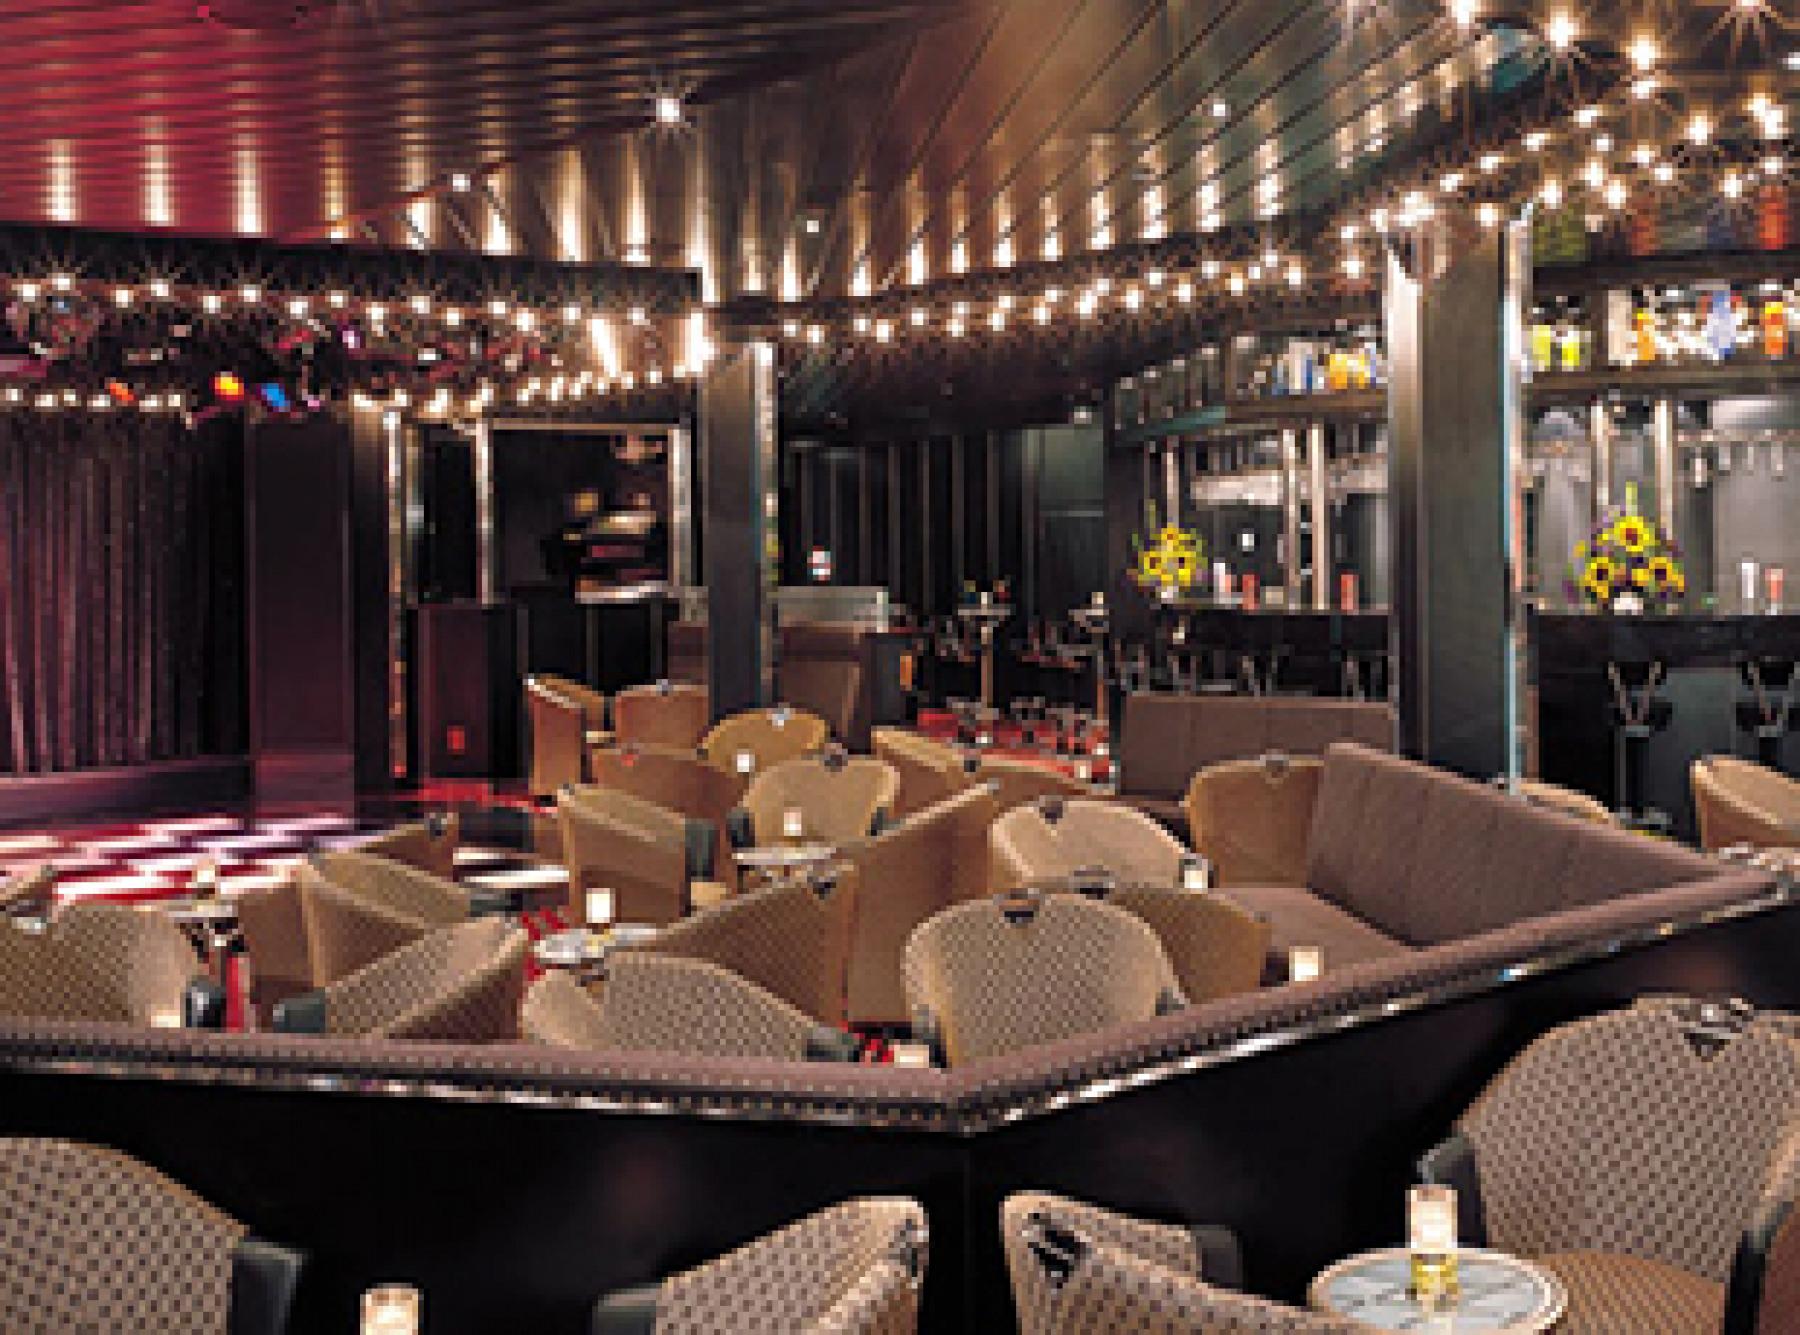 Norwegian Cruise Line Norwegian Sky Interior Dazzles Nightclub.jpg